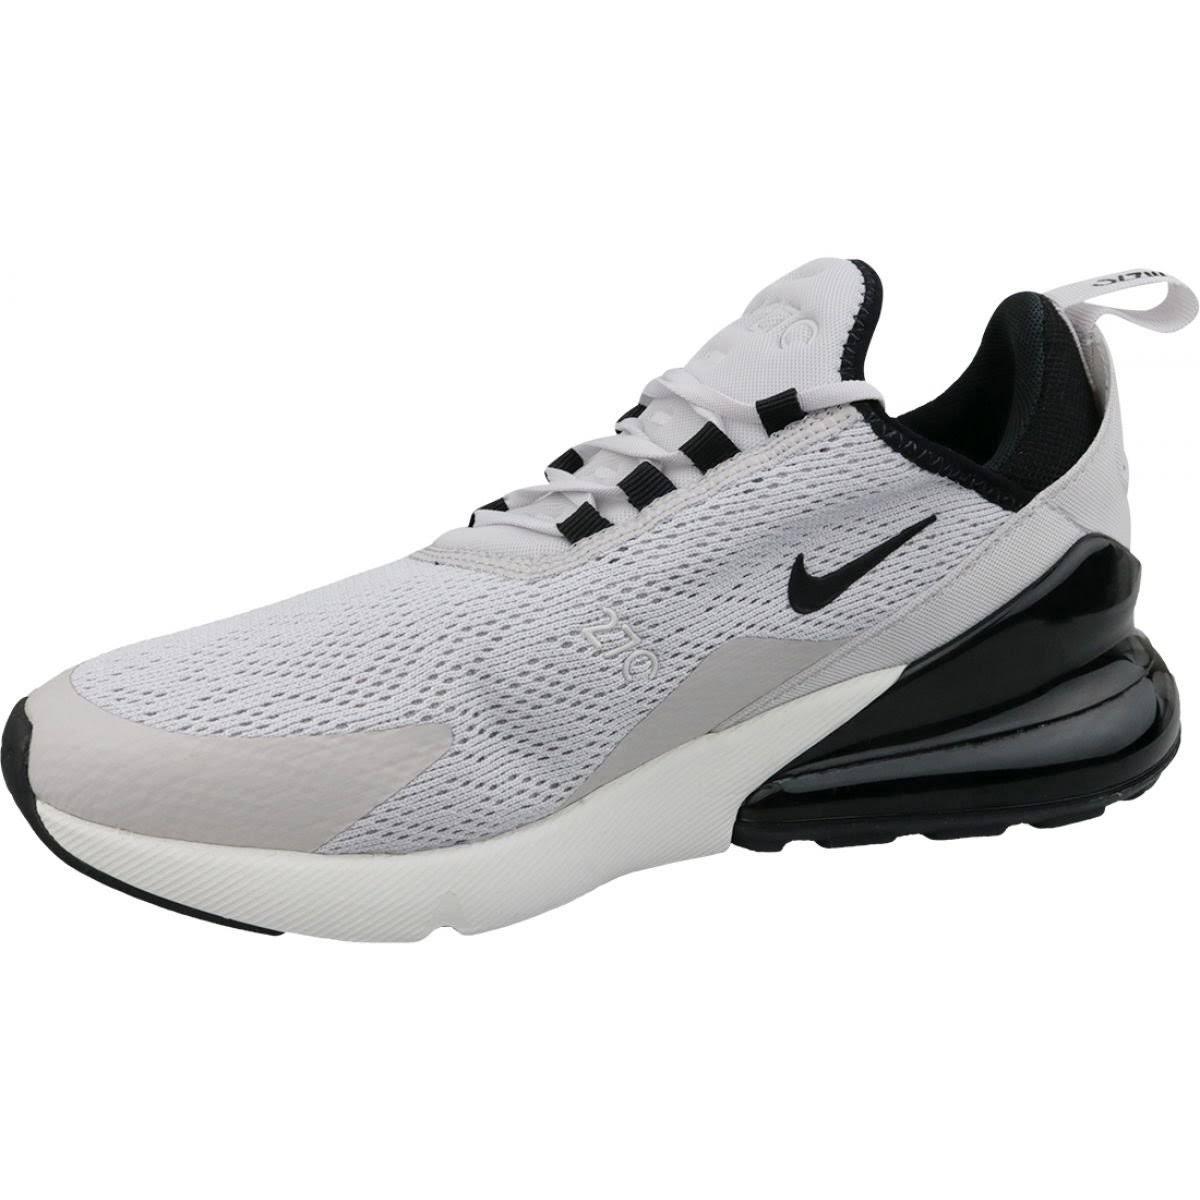 Nike Air Max 270 Vast Grey Black (W)